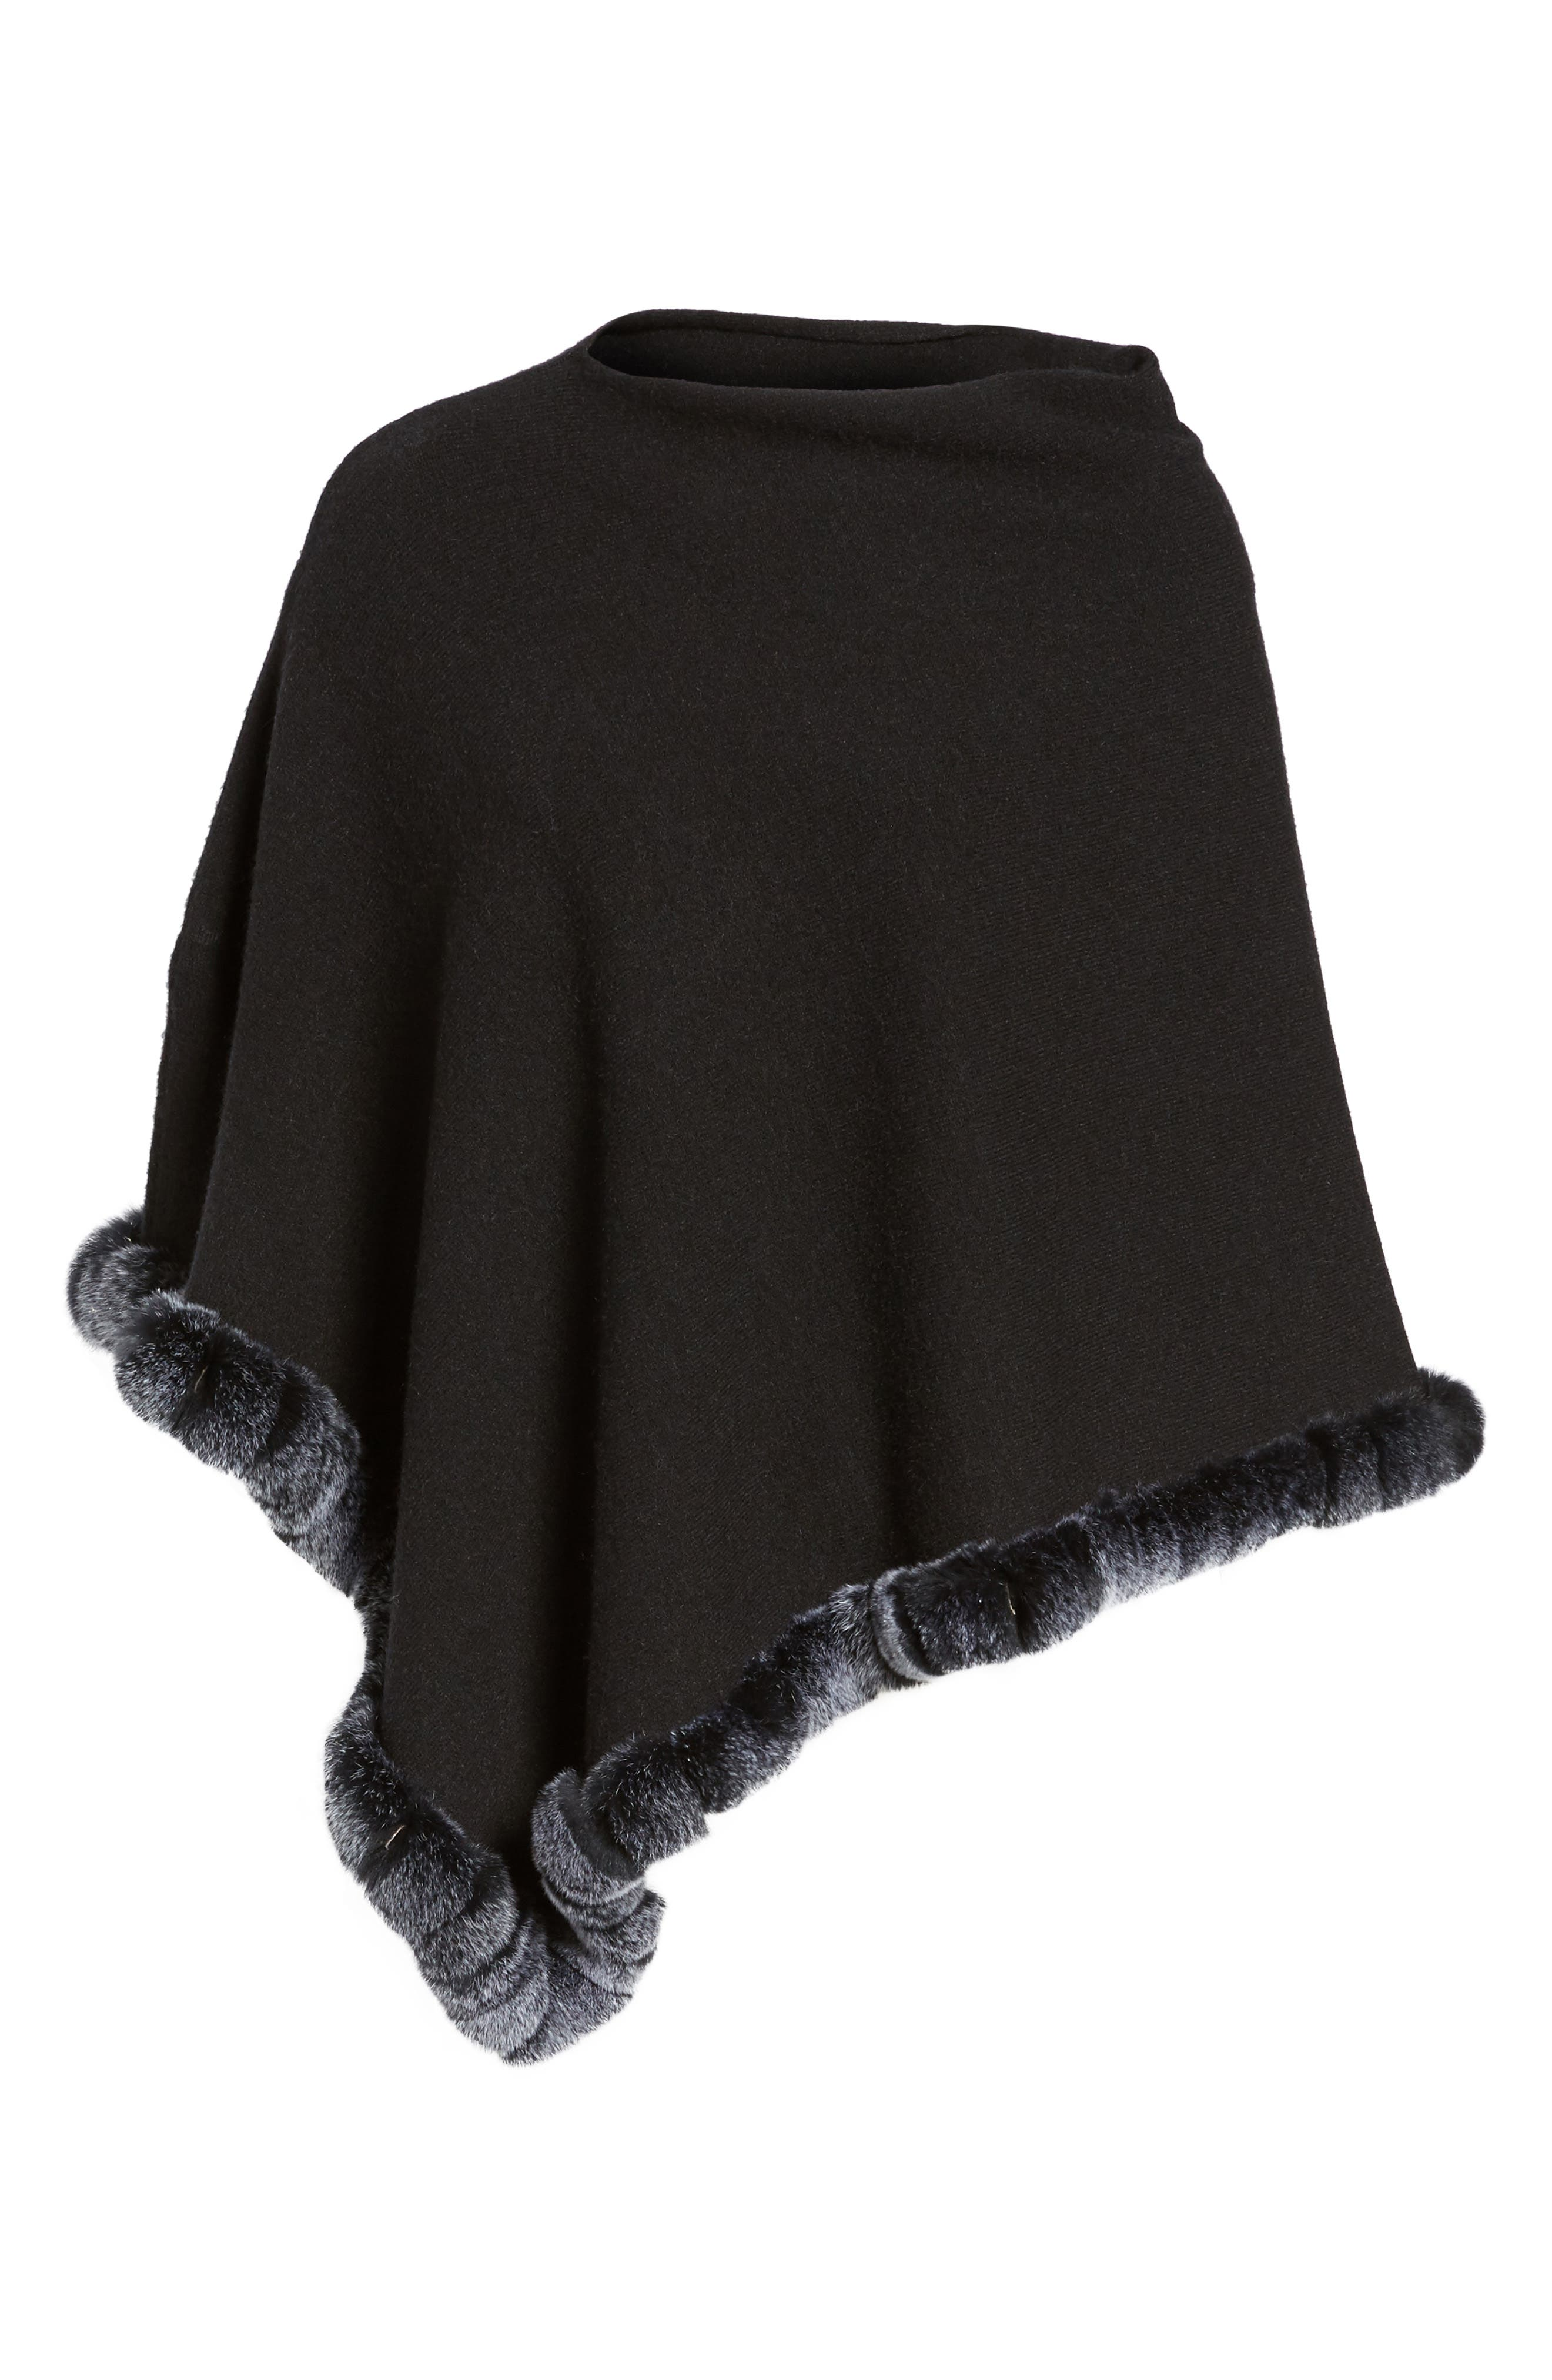 Angled Poncho with Genuine Rabbit Fur Trim,                             Alternate thumbnail 6, color,                             Black